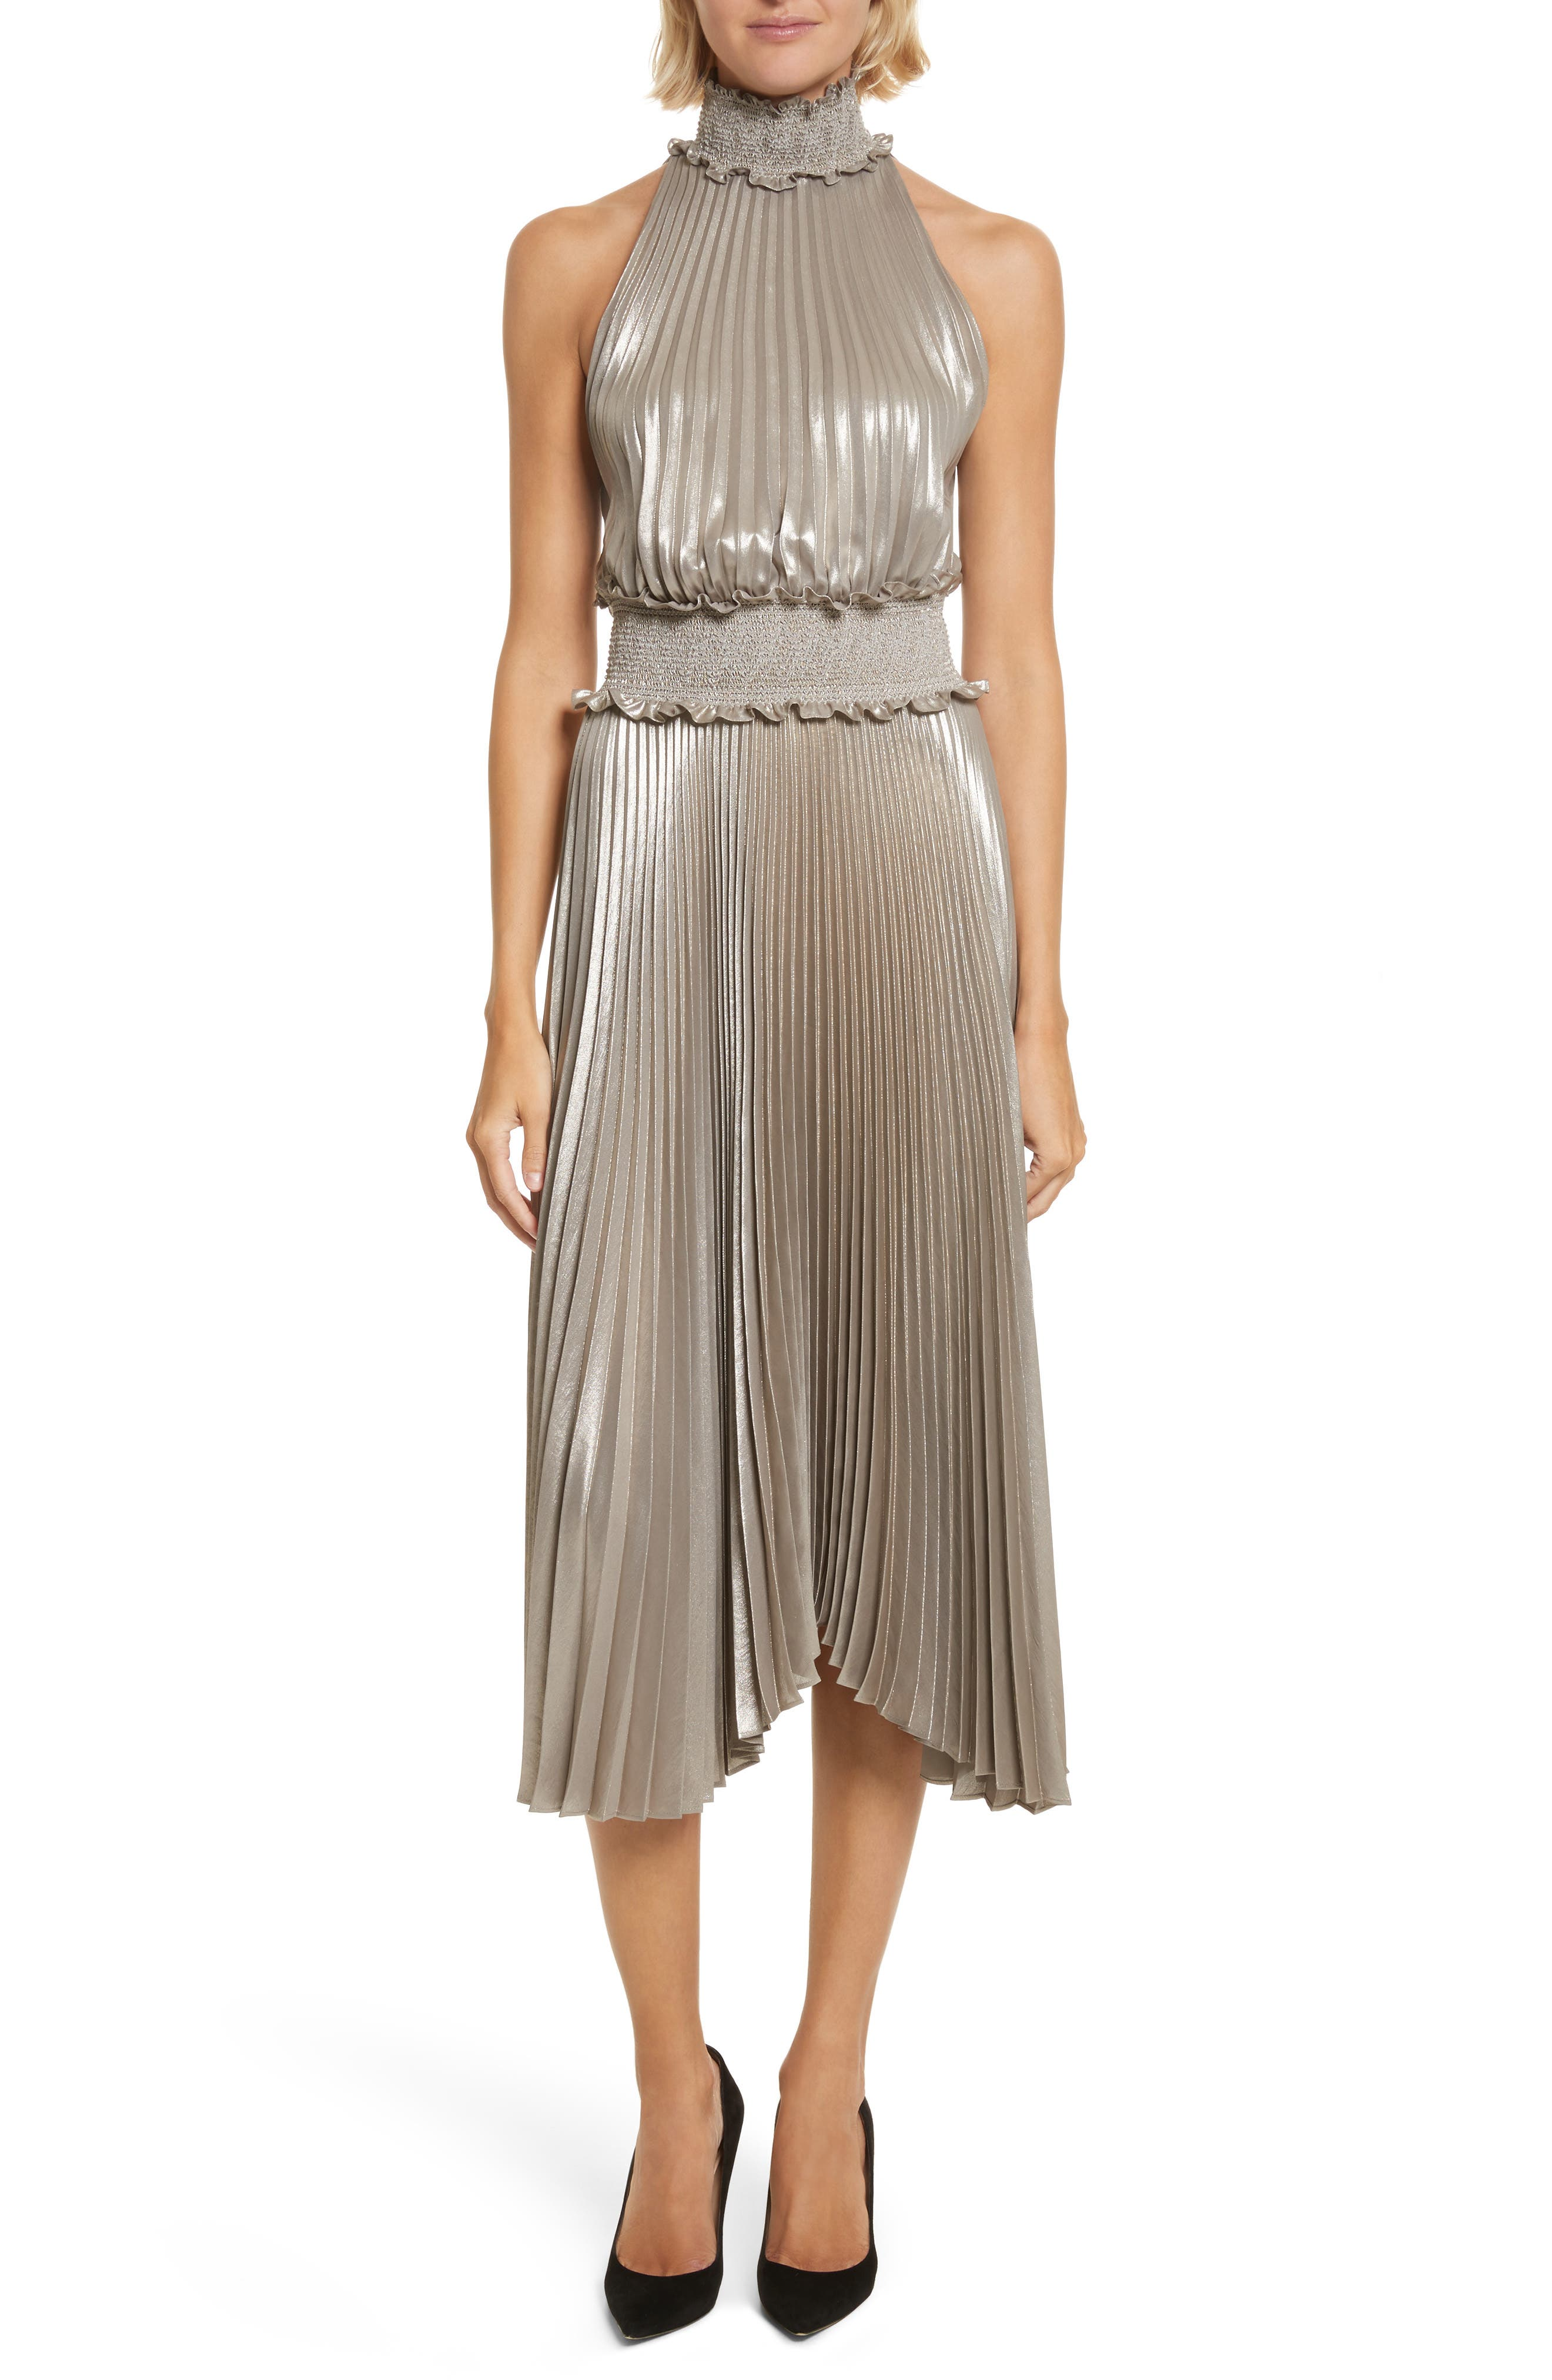 Alternate Image 1 Selected - A.L.C. Kravitz Pleated Midi Dress